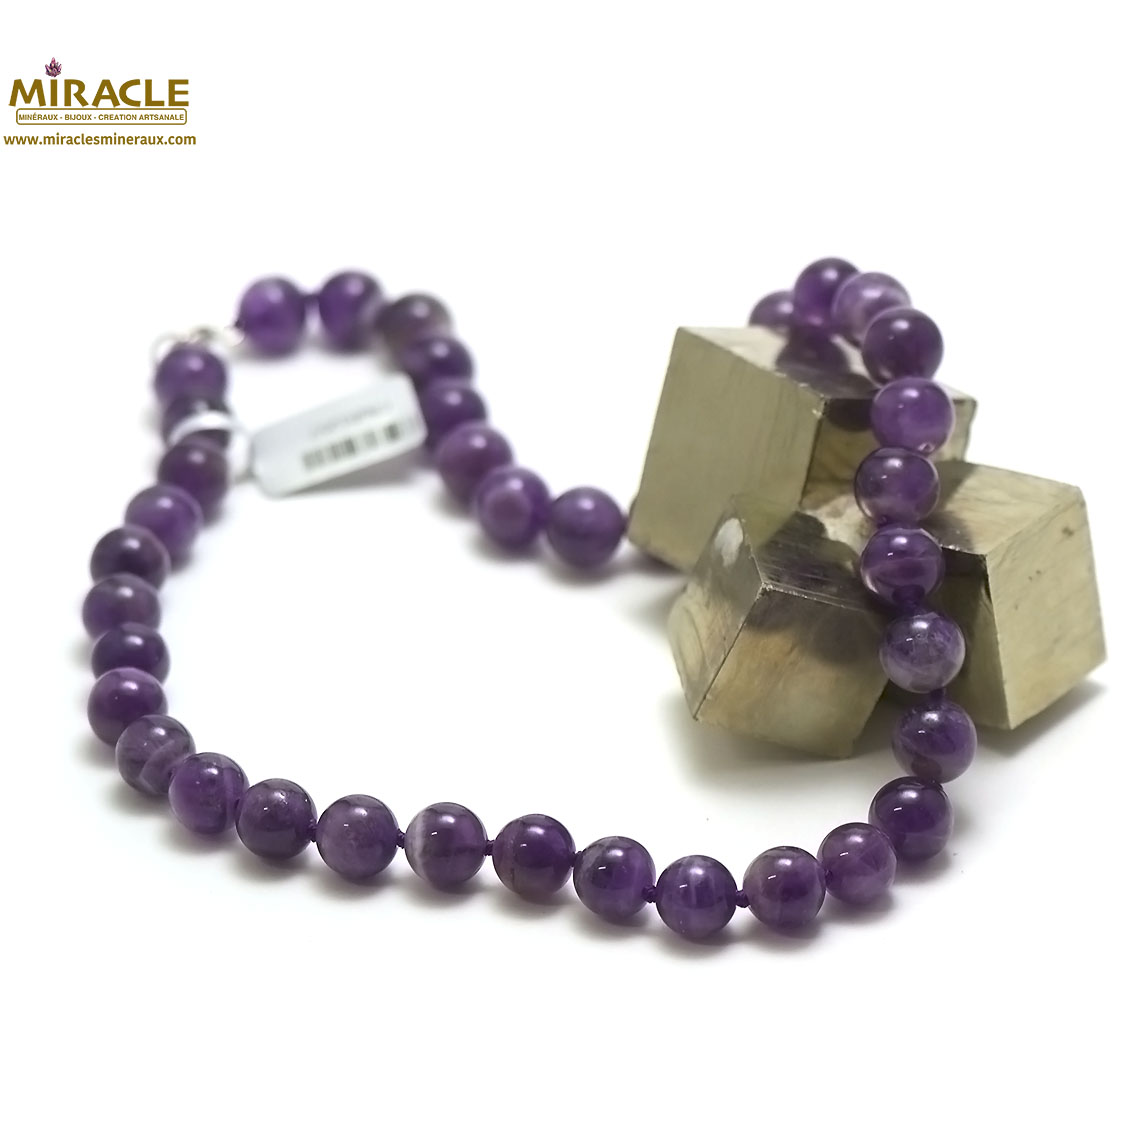 Collier améthyste perles rondes 10 mm